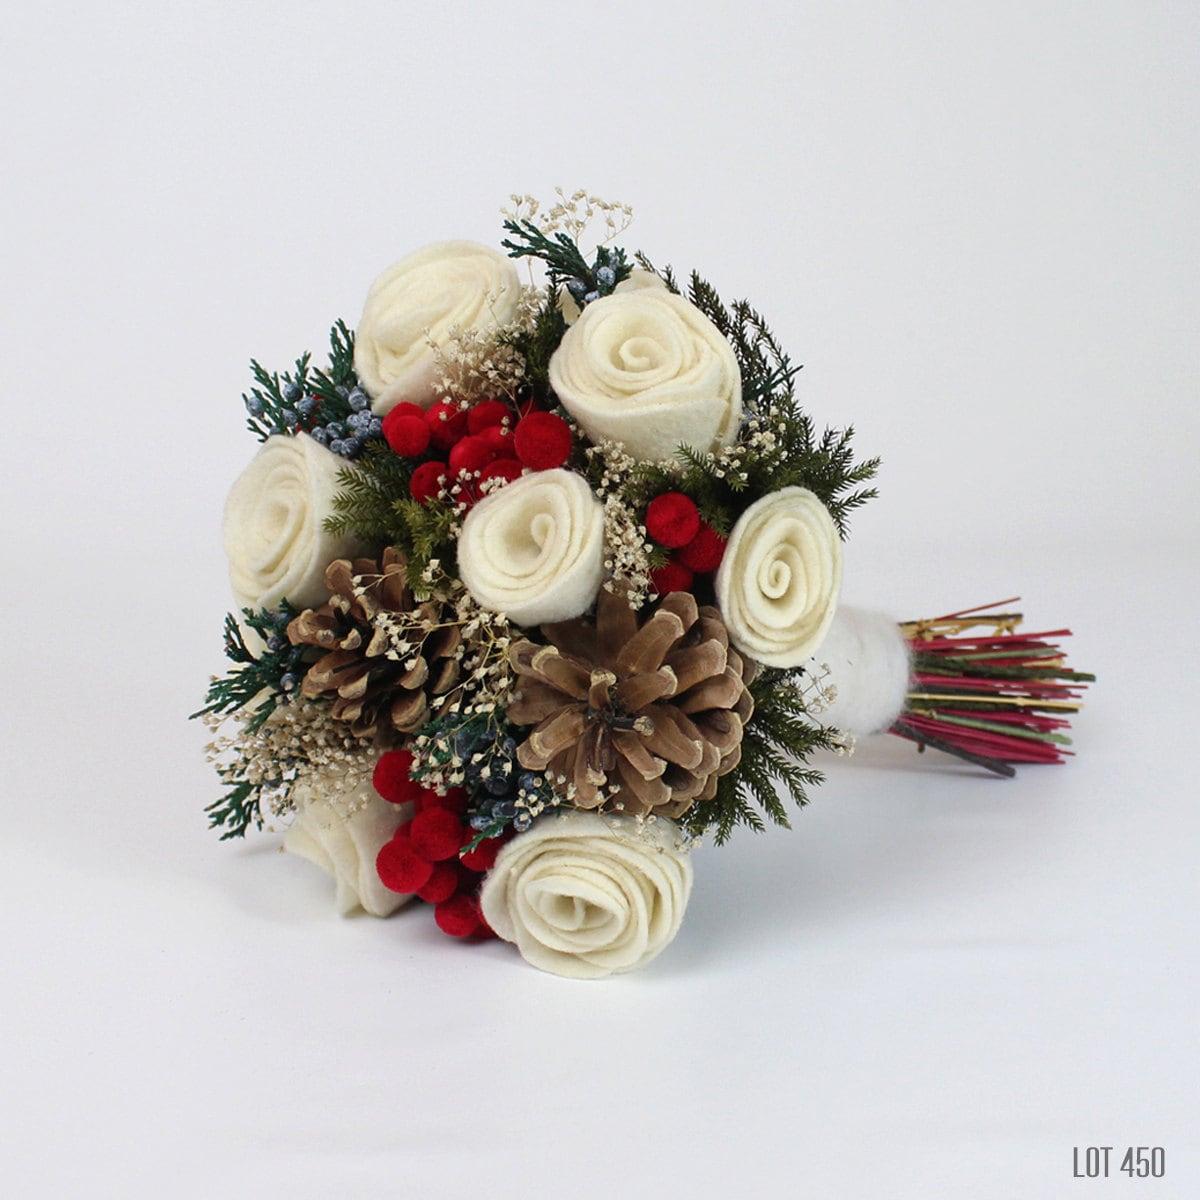 Christmas Wedding: Christmas Wedding Bouquet Holiday Bridal Boquet By Lot450shop